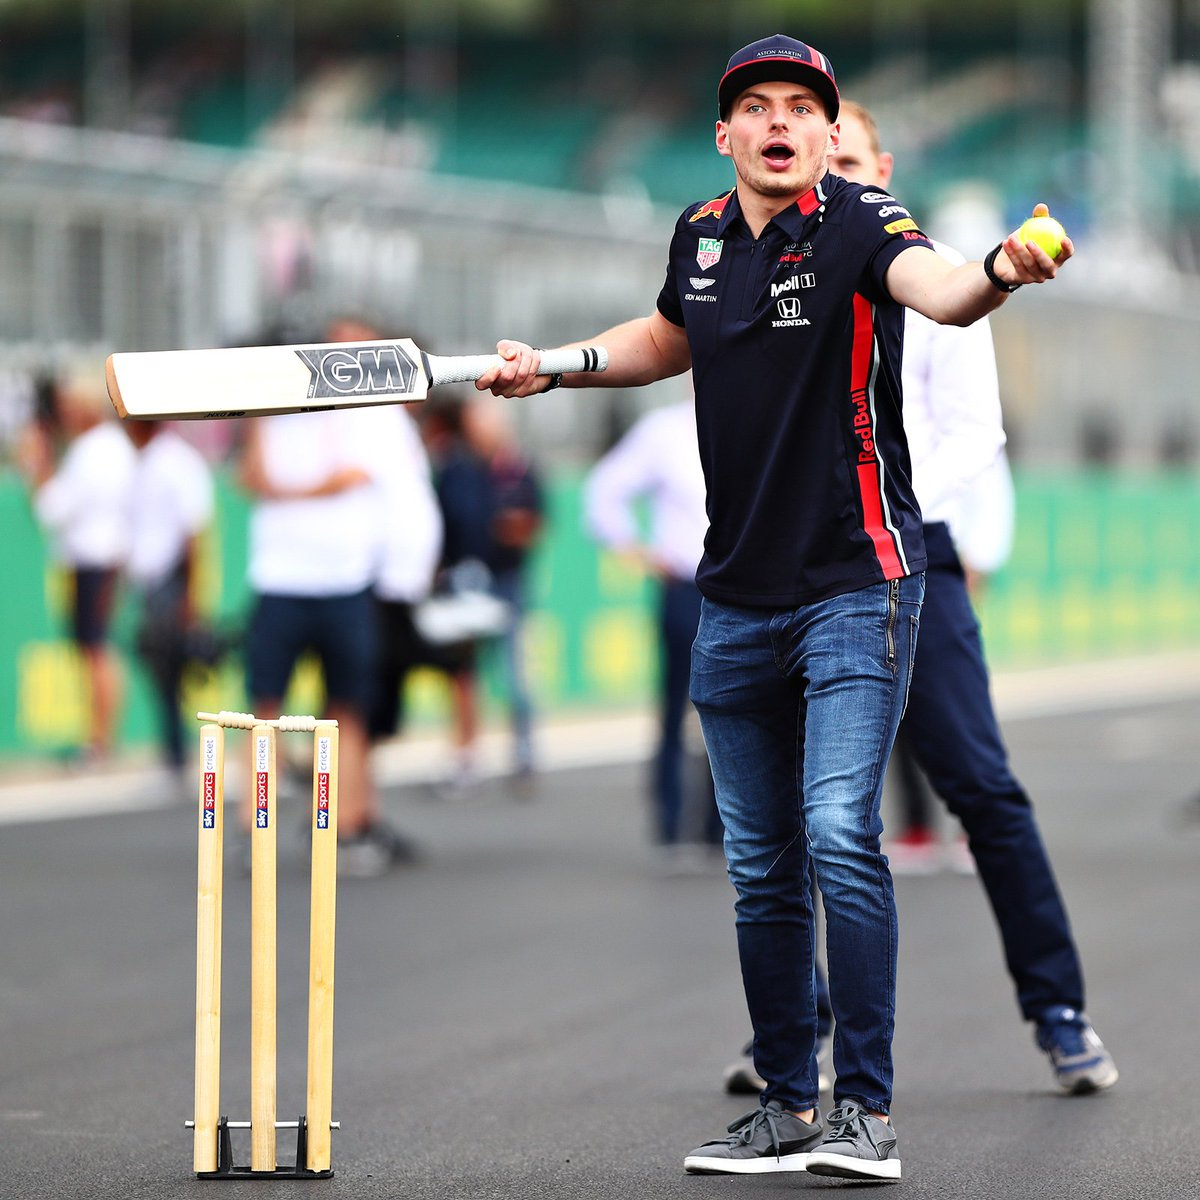 I guess I'll better stick to racing 😂 #cricket #BritishGP 🇬🇧